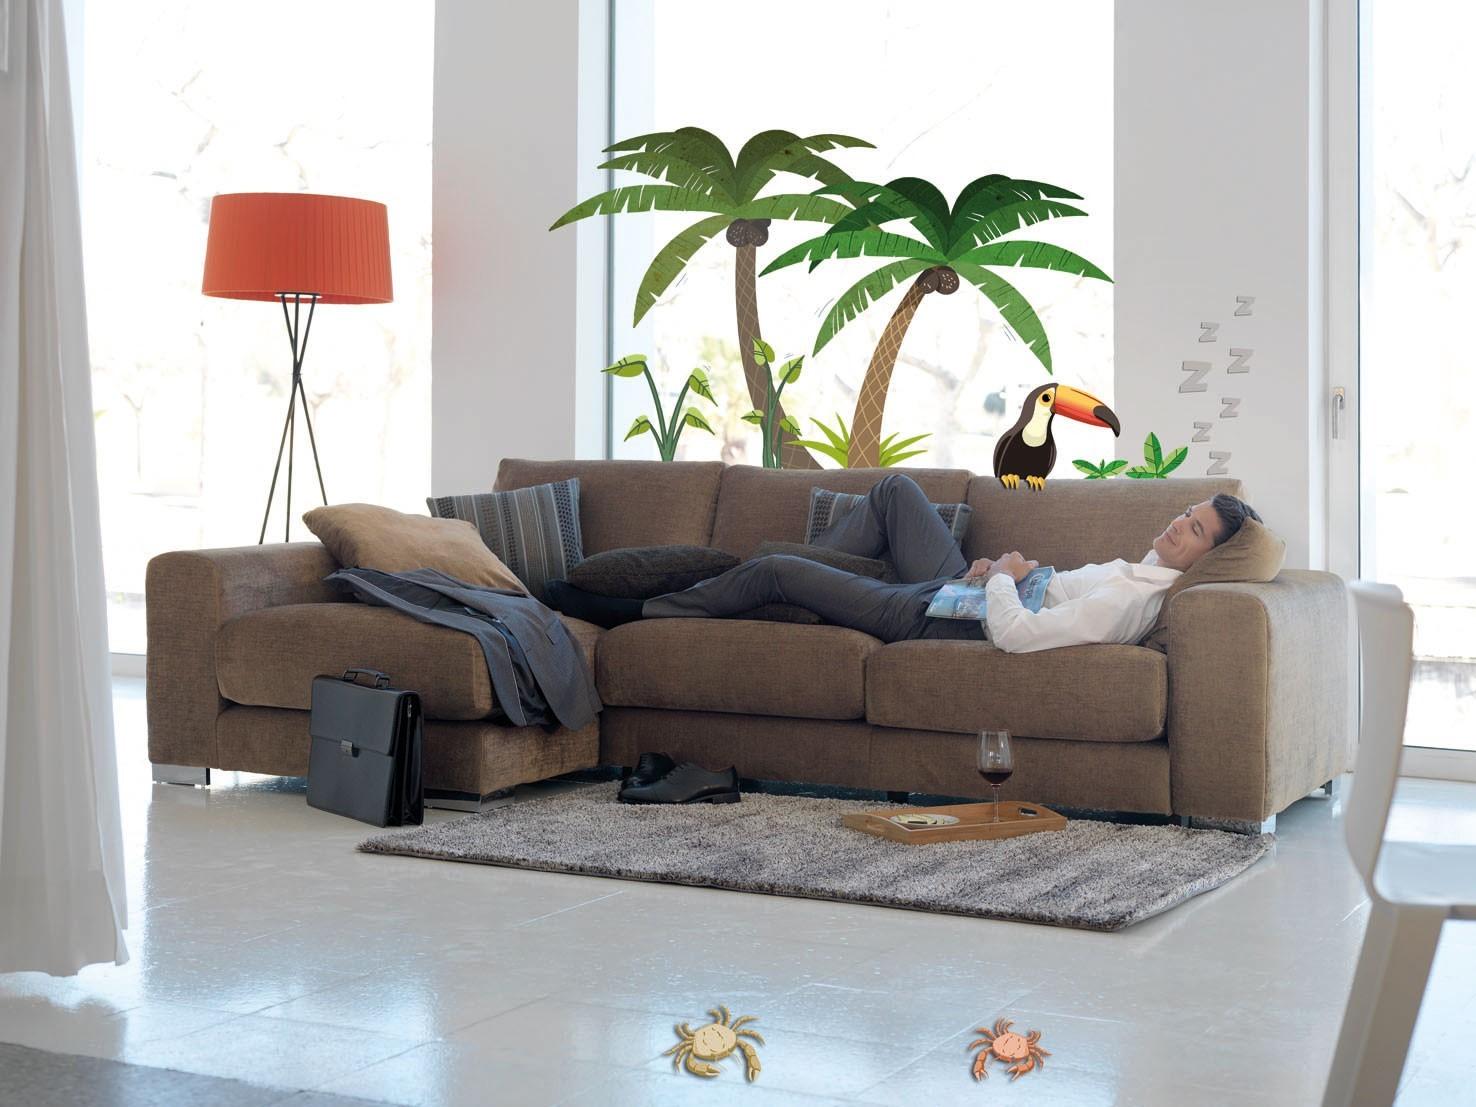 Sof comprar sof decoraci n sof s - Dormire sul divano ...